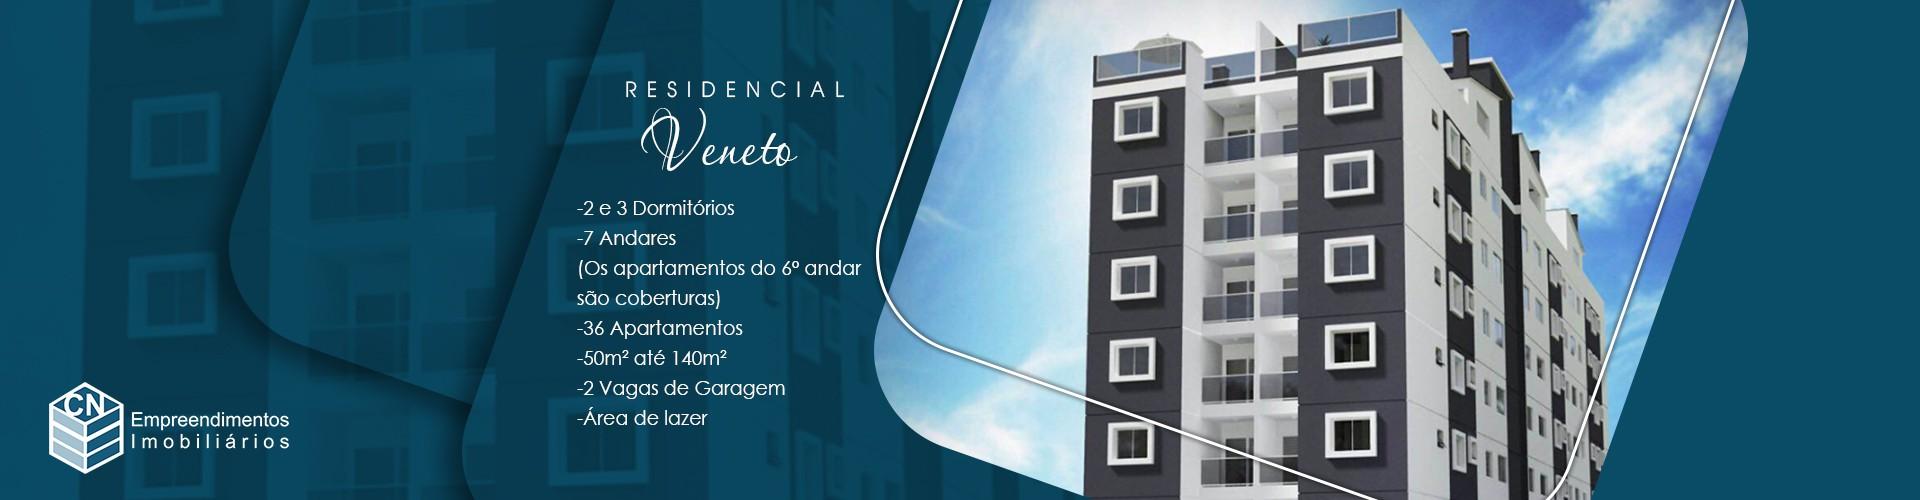 Residencial Veneto - Apartamento na Vila Vitória em Mauá